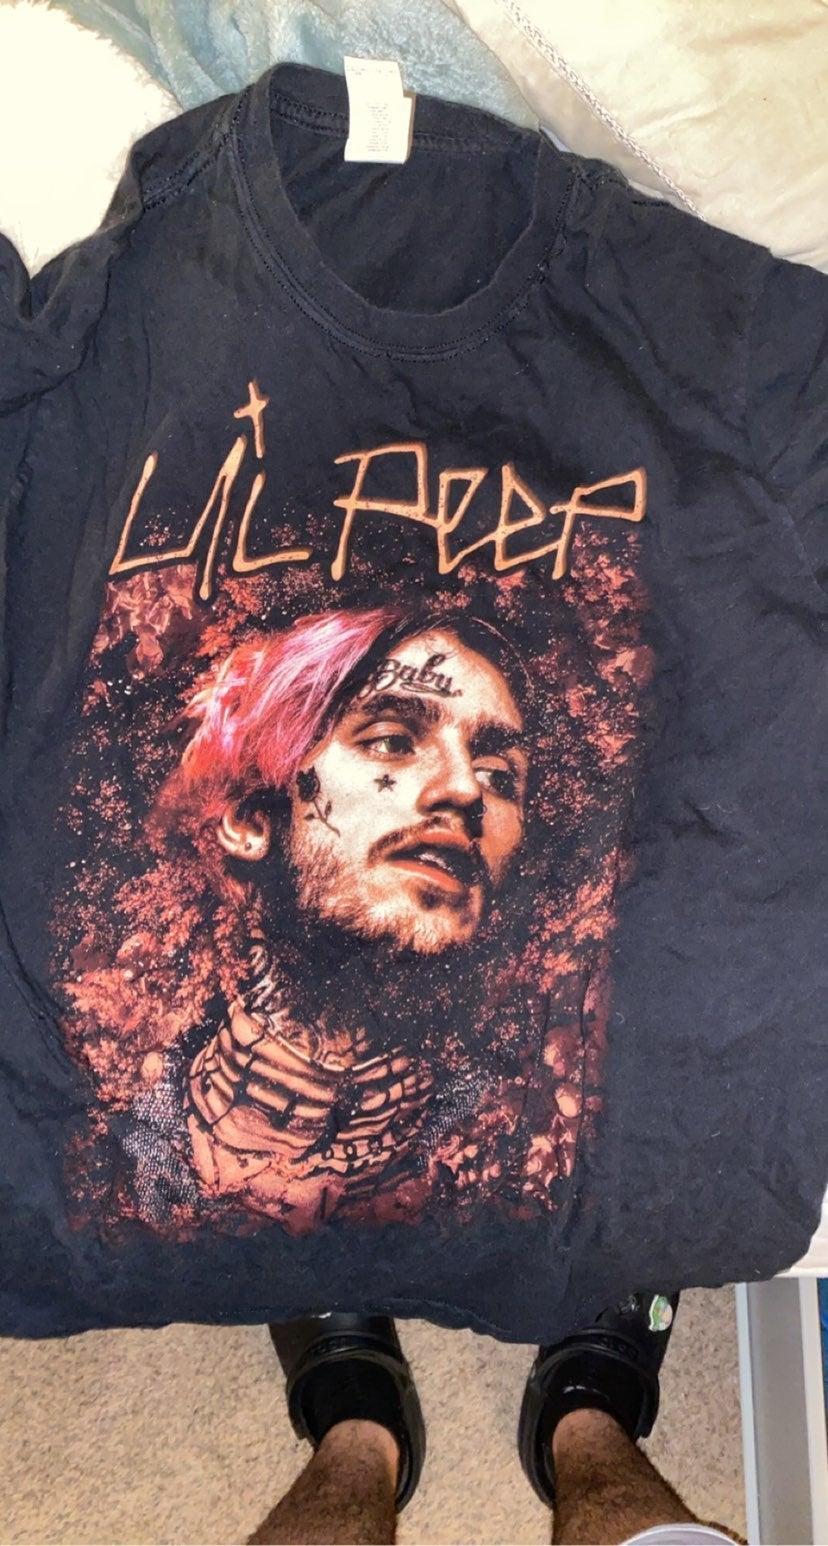 Lil peep shirt